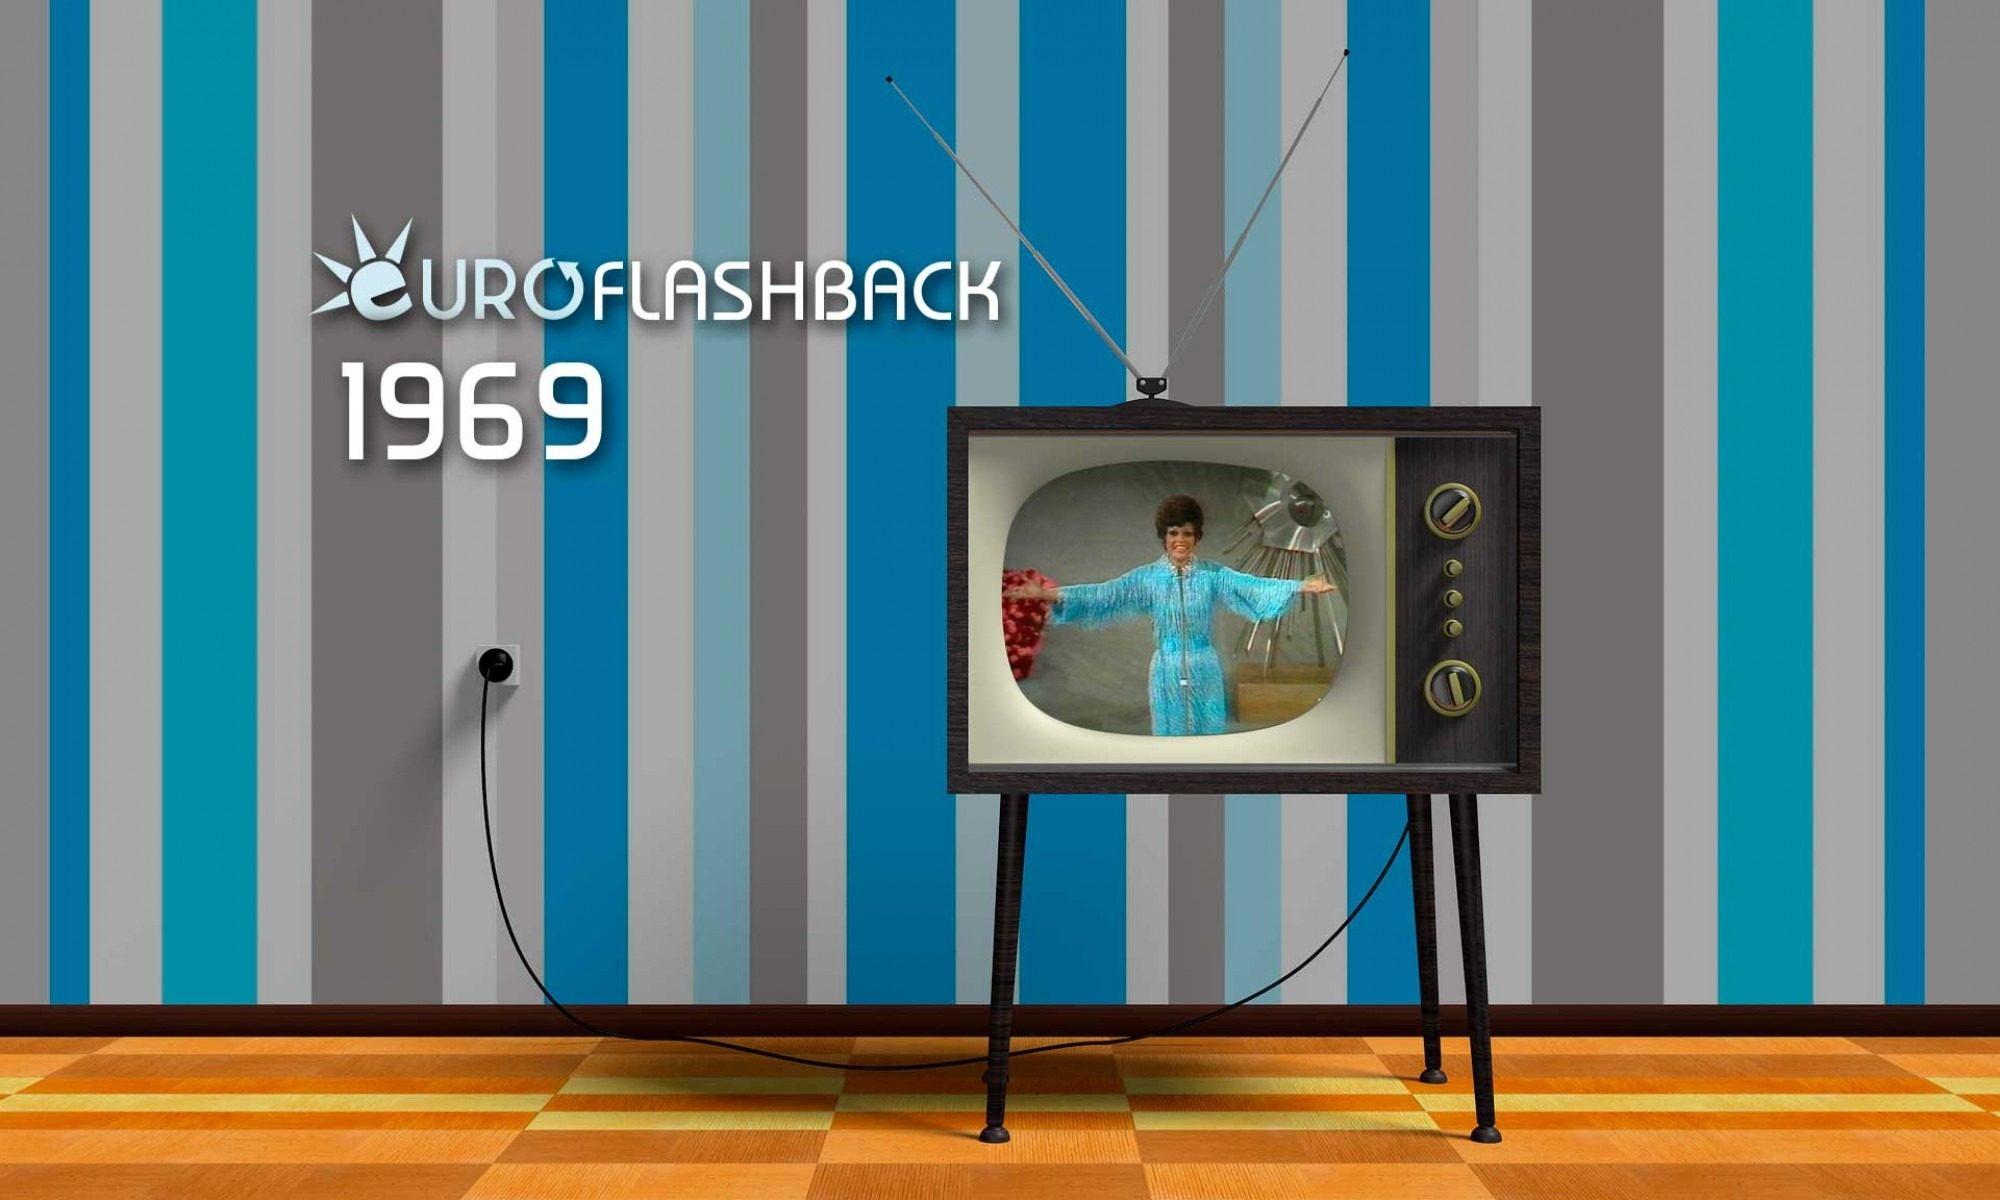 29032019_112044_EUROFLASHBACK-1969_grande